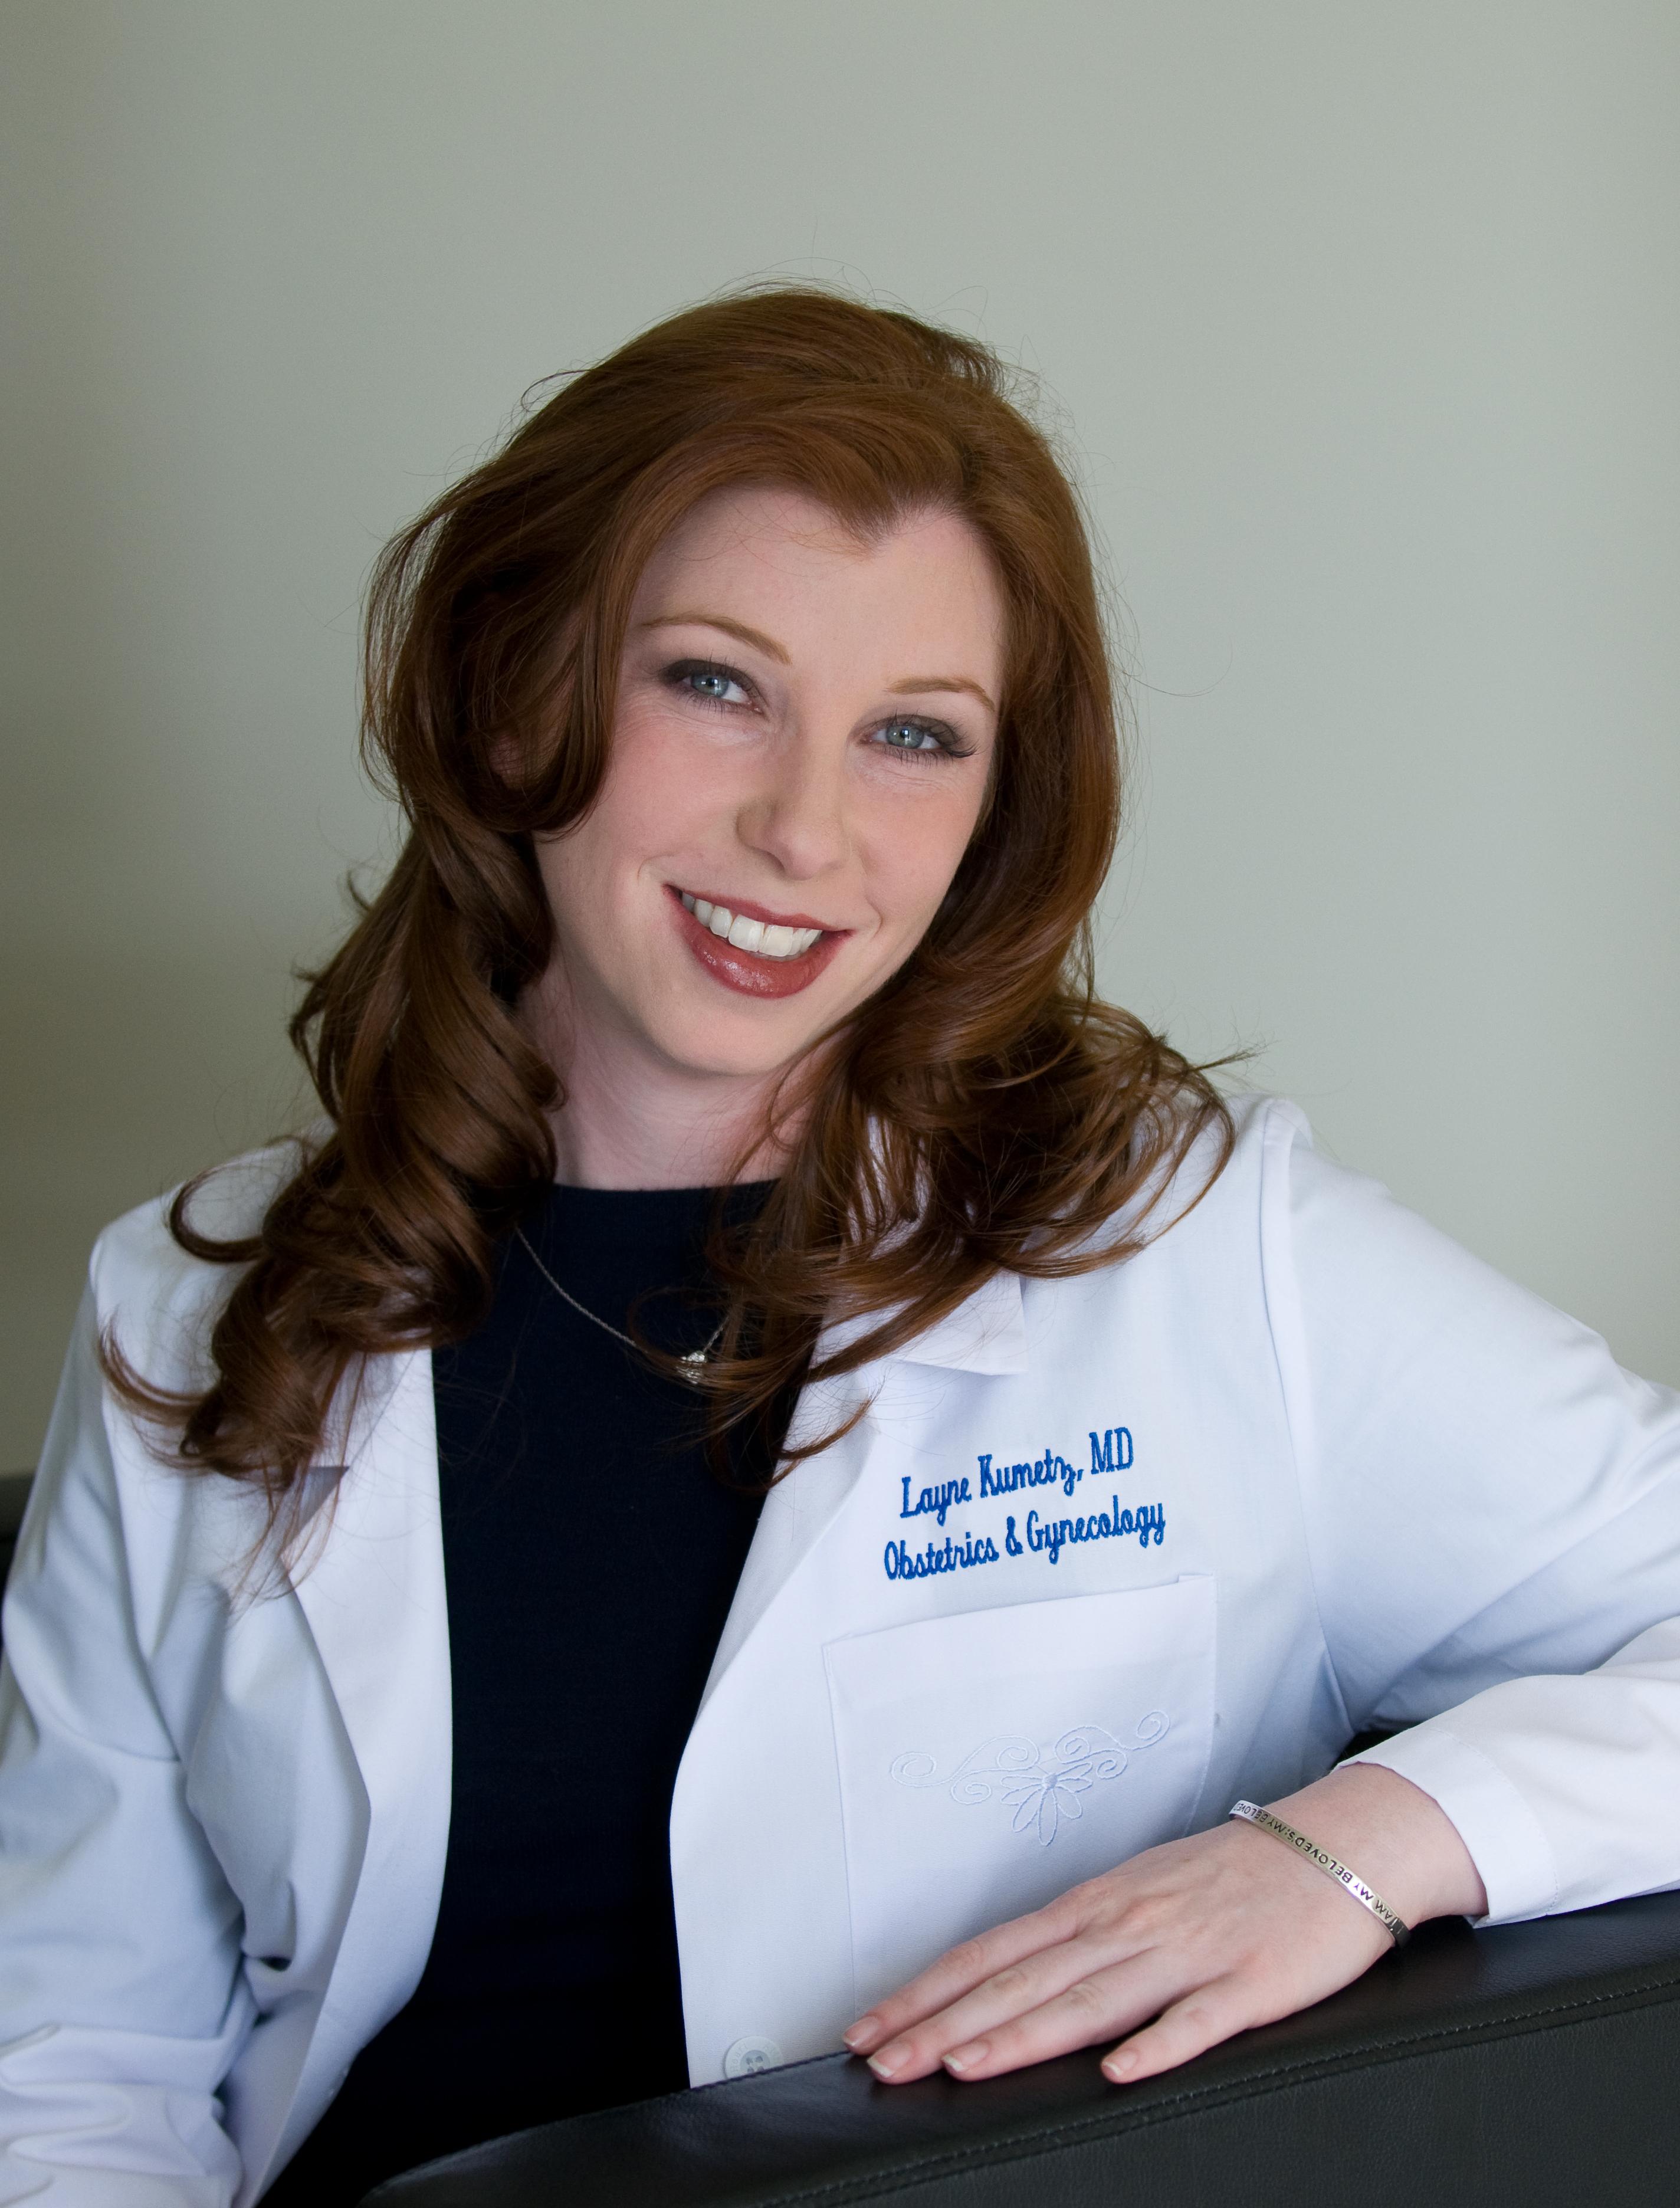 Dr. Layne Kumetz - Layne Kumetz, MD FACOG